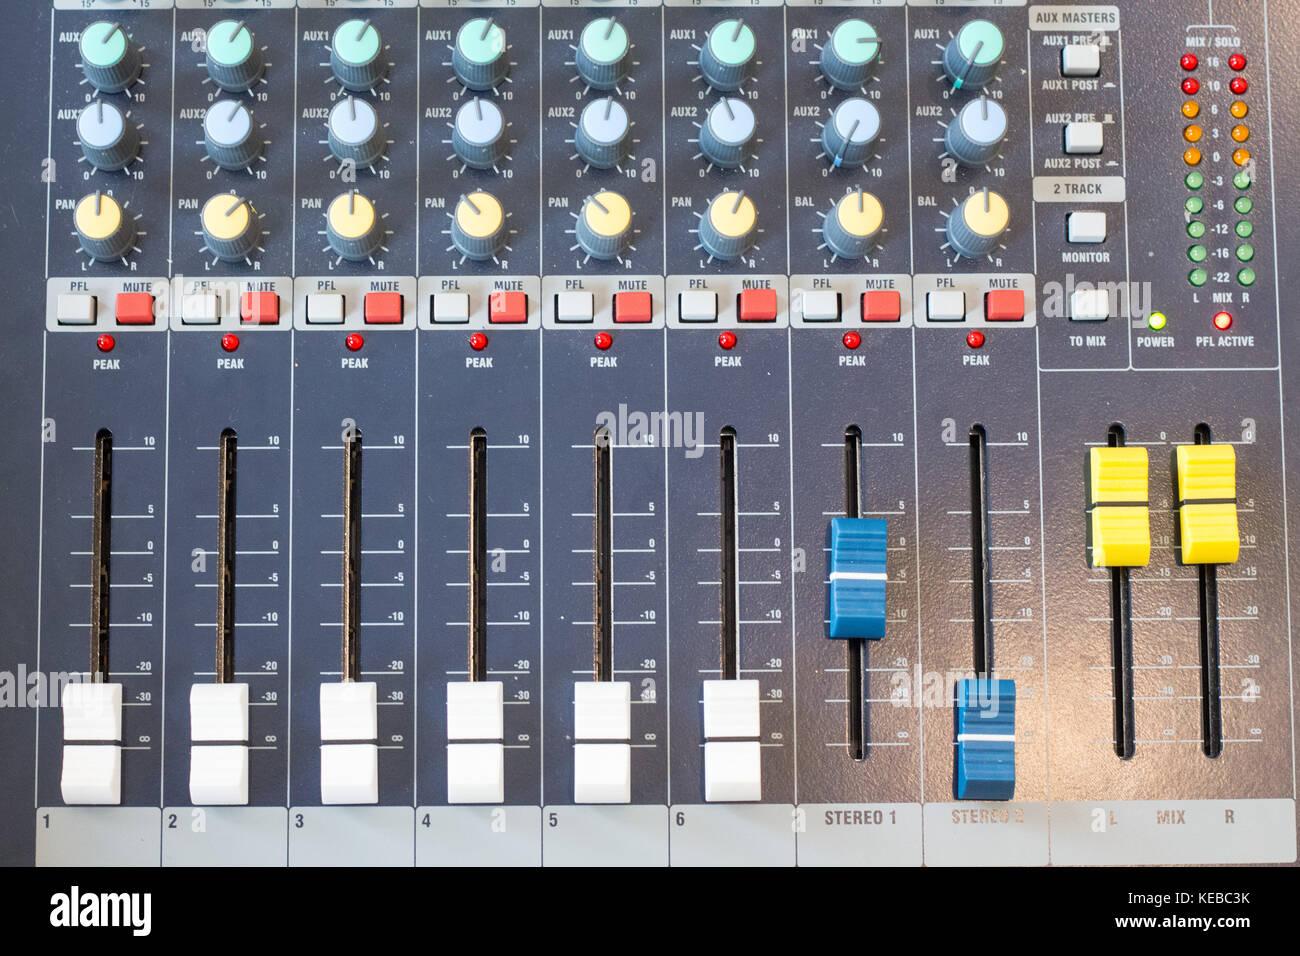 Dj audio mixer controller.Hip hop party dj equipment.Scratch records,mix music tracks.Audio mixer knobs,faders in - Stock Image